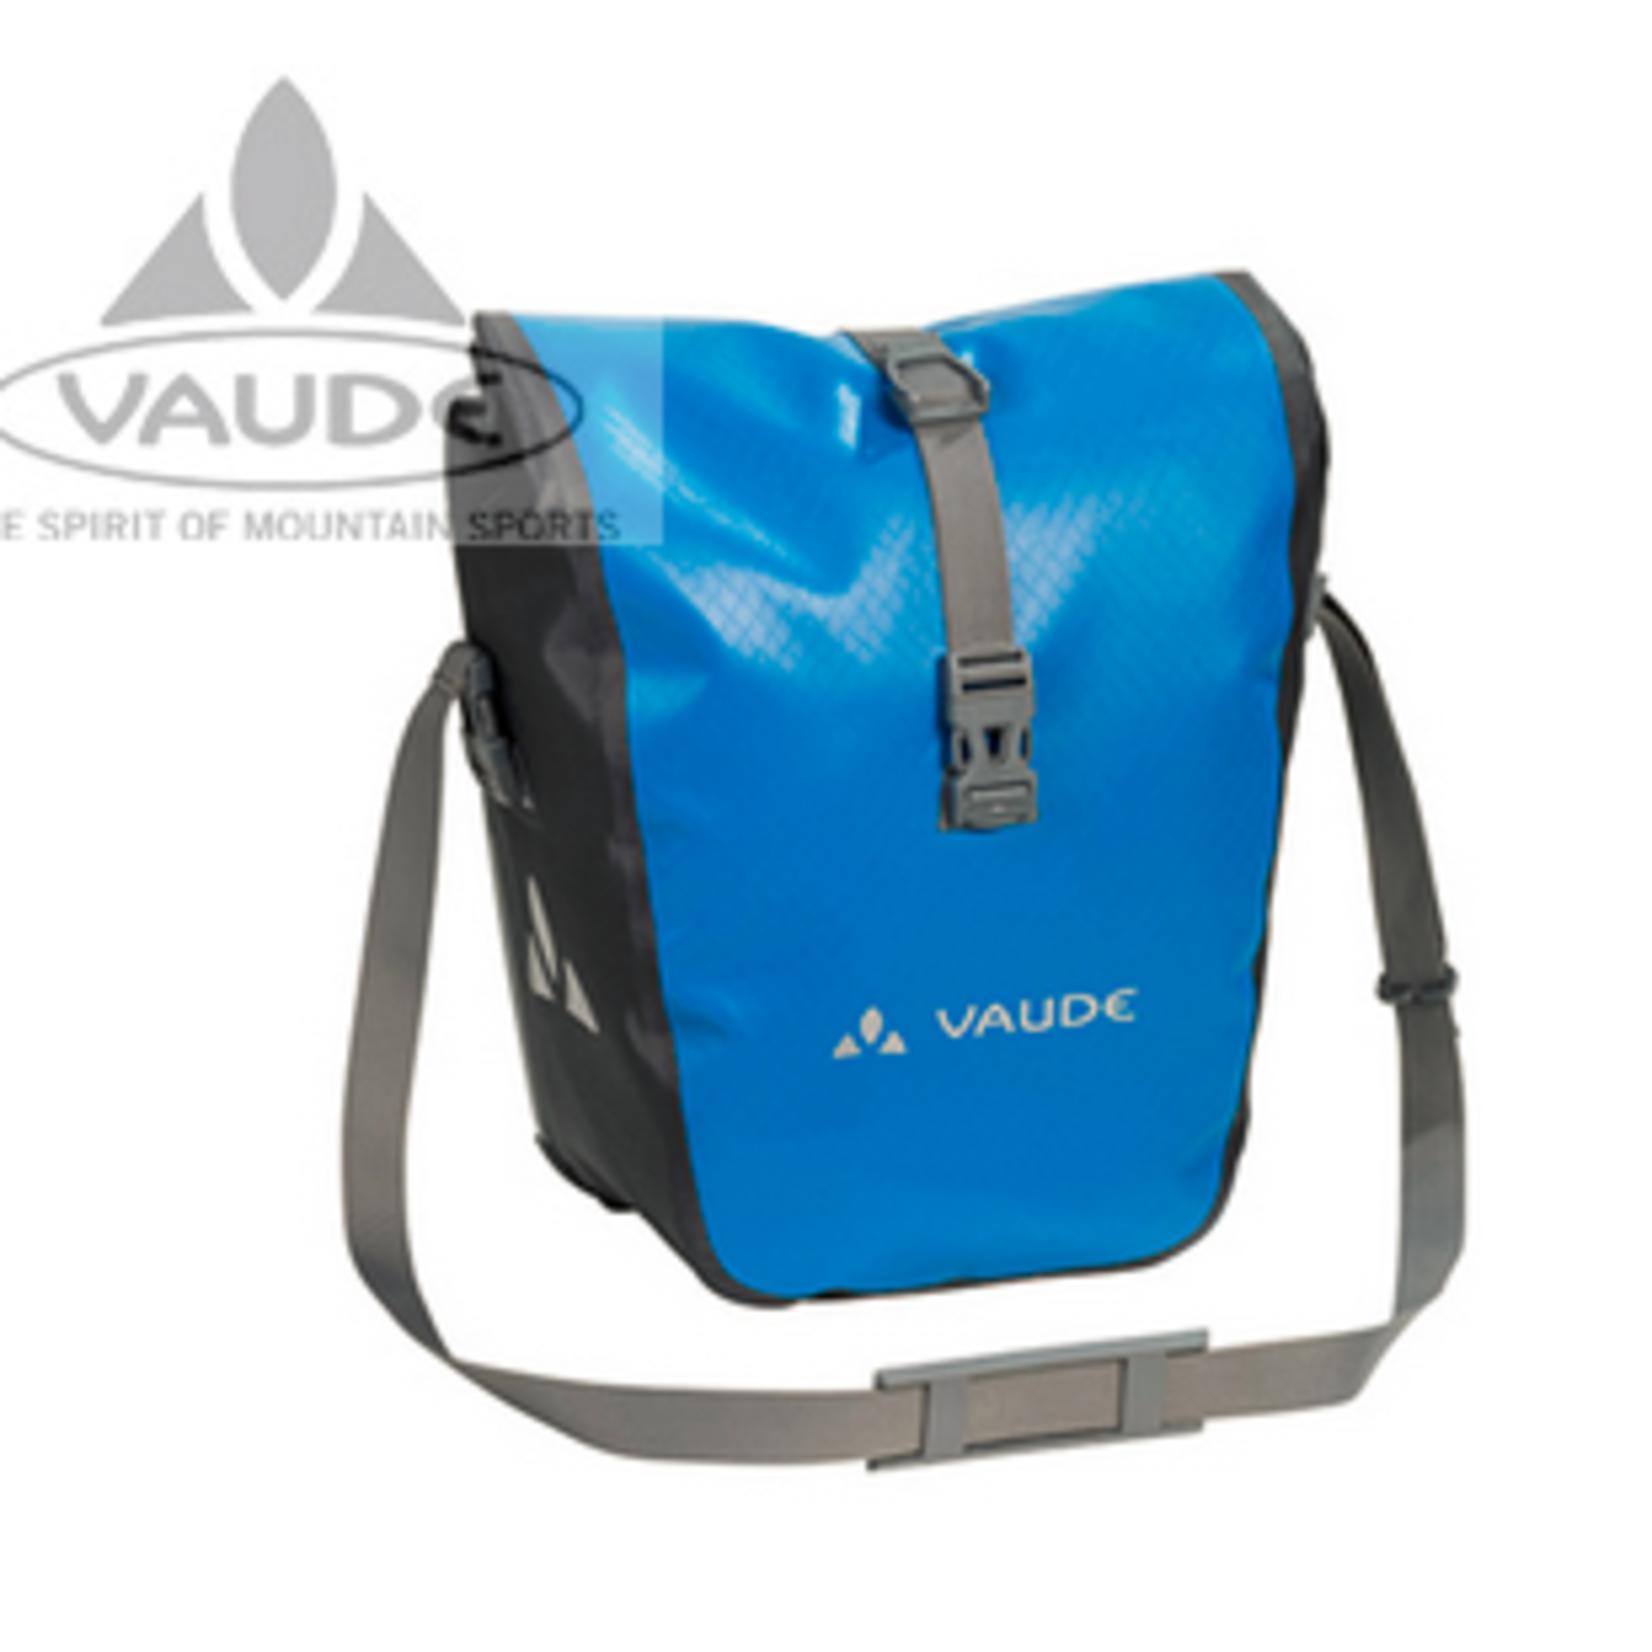 Vaude Vaude Aqua Front Pair Blue